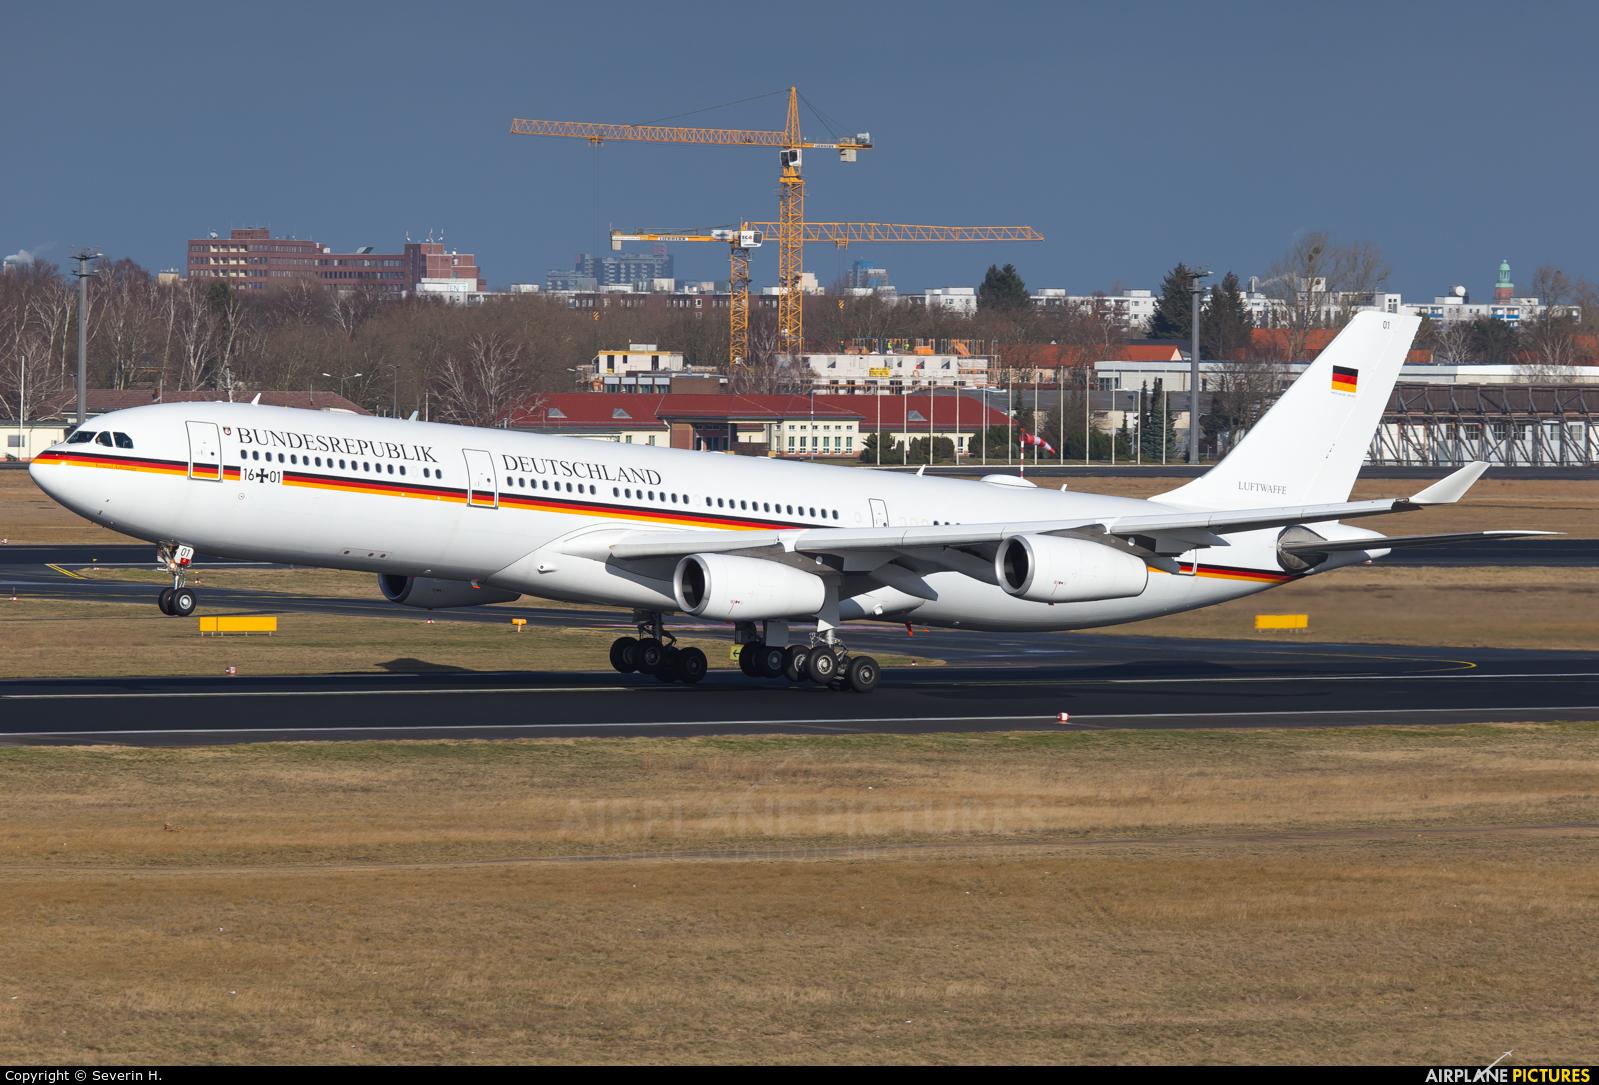 Germany - Air Force 16+01 aircraft at Berlin - Tegel